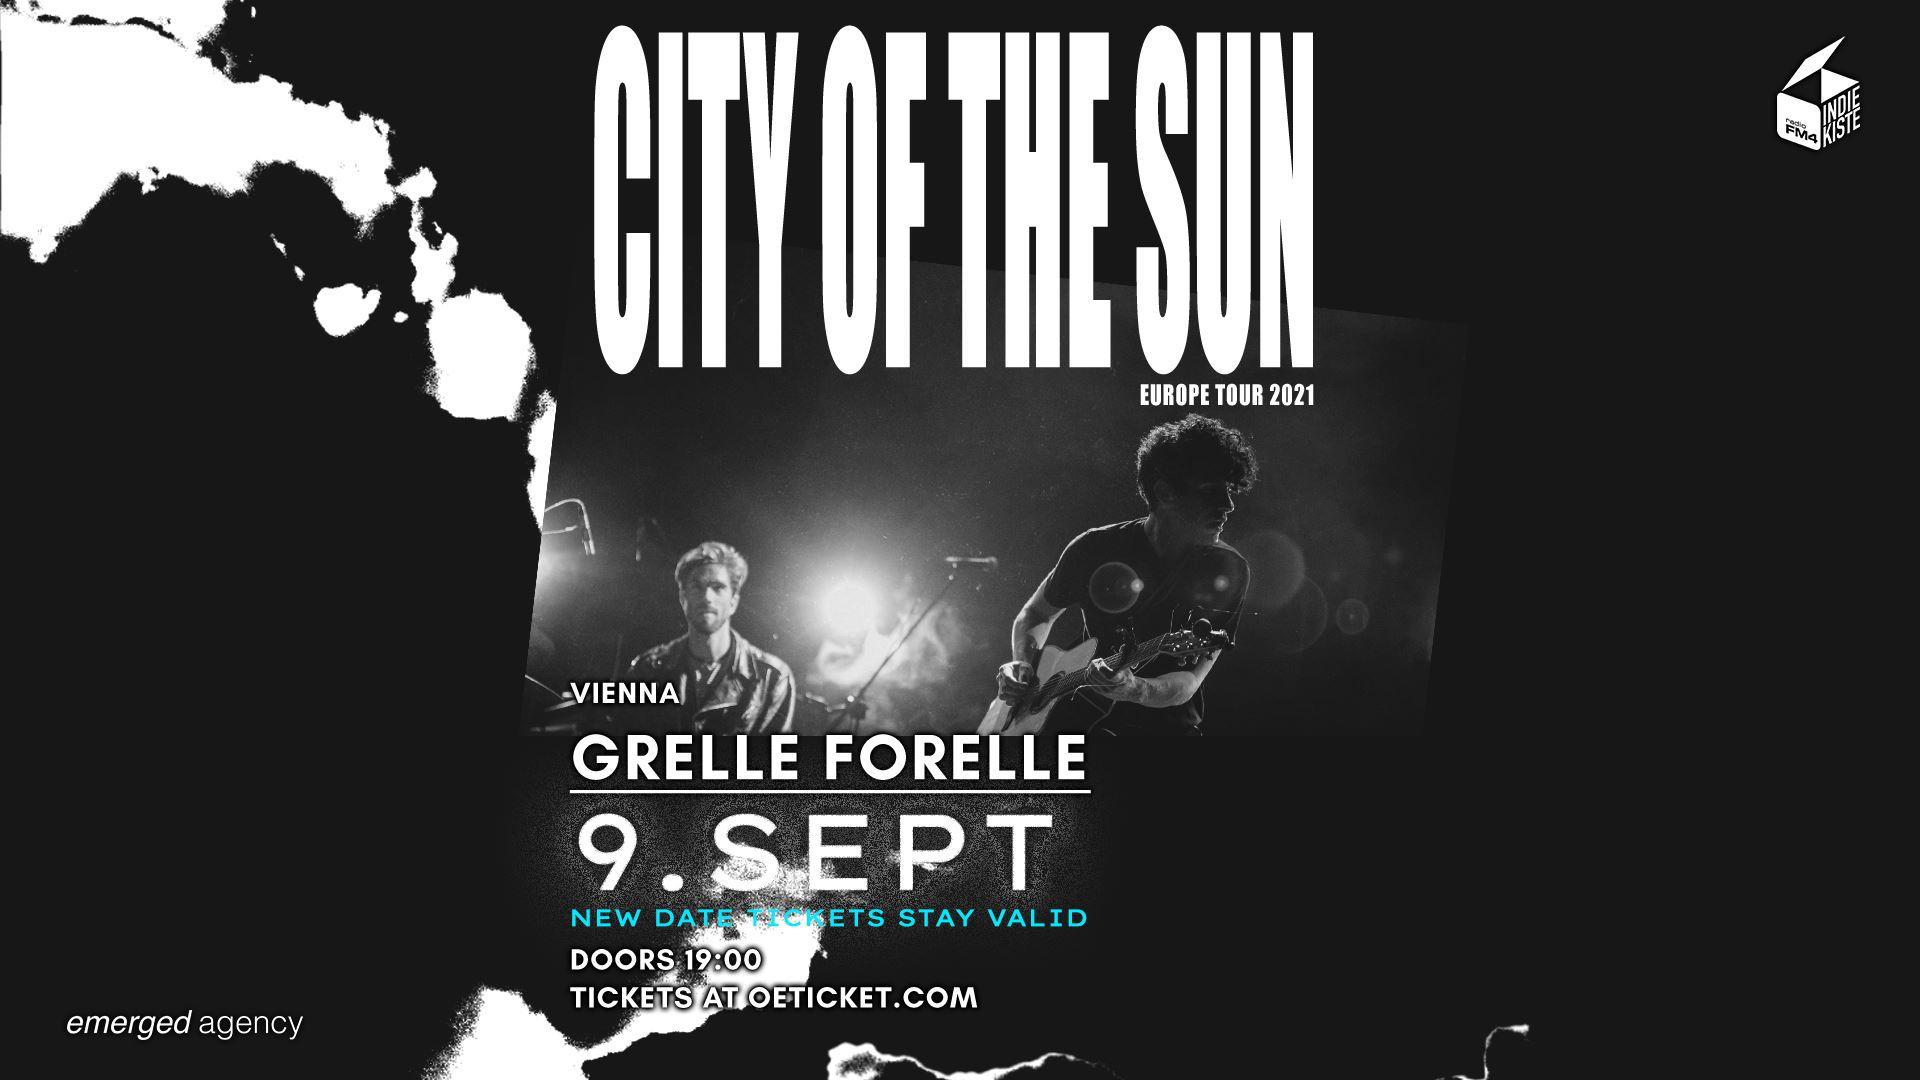 Events Wien: FM4 Indiekiste mit City of the Sun | Grelle Forelle, Wien